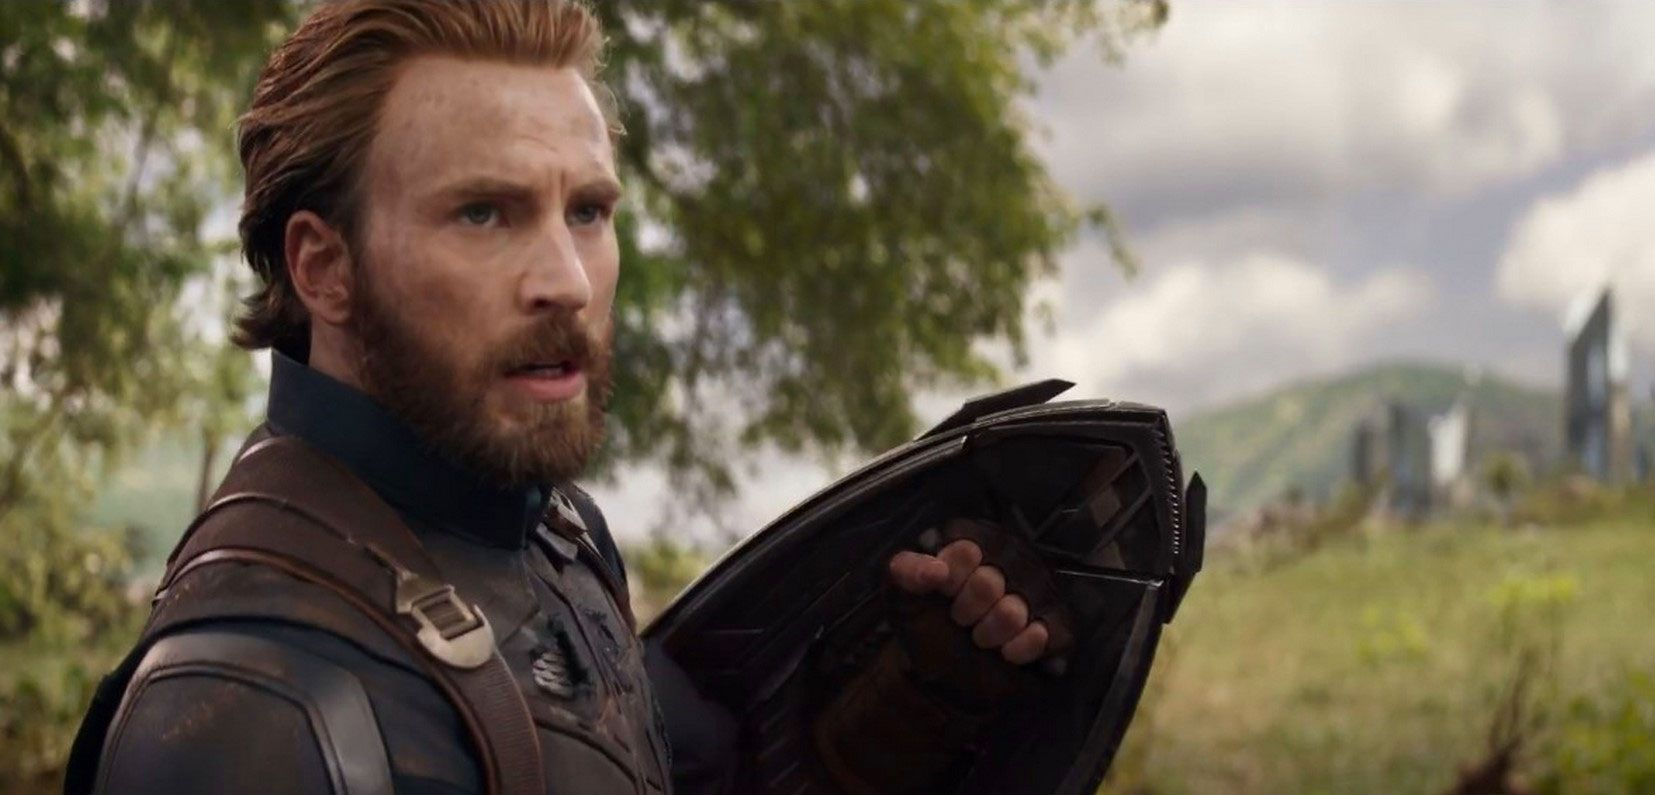 Avengers: Endgame star Chris Evans' bizarre favourite pastime makes us love him even more